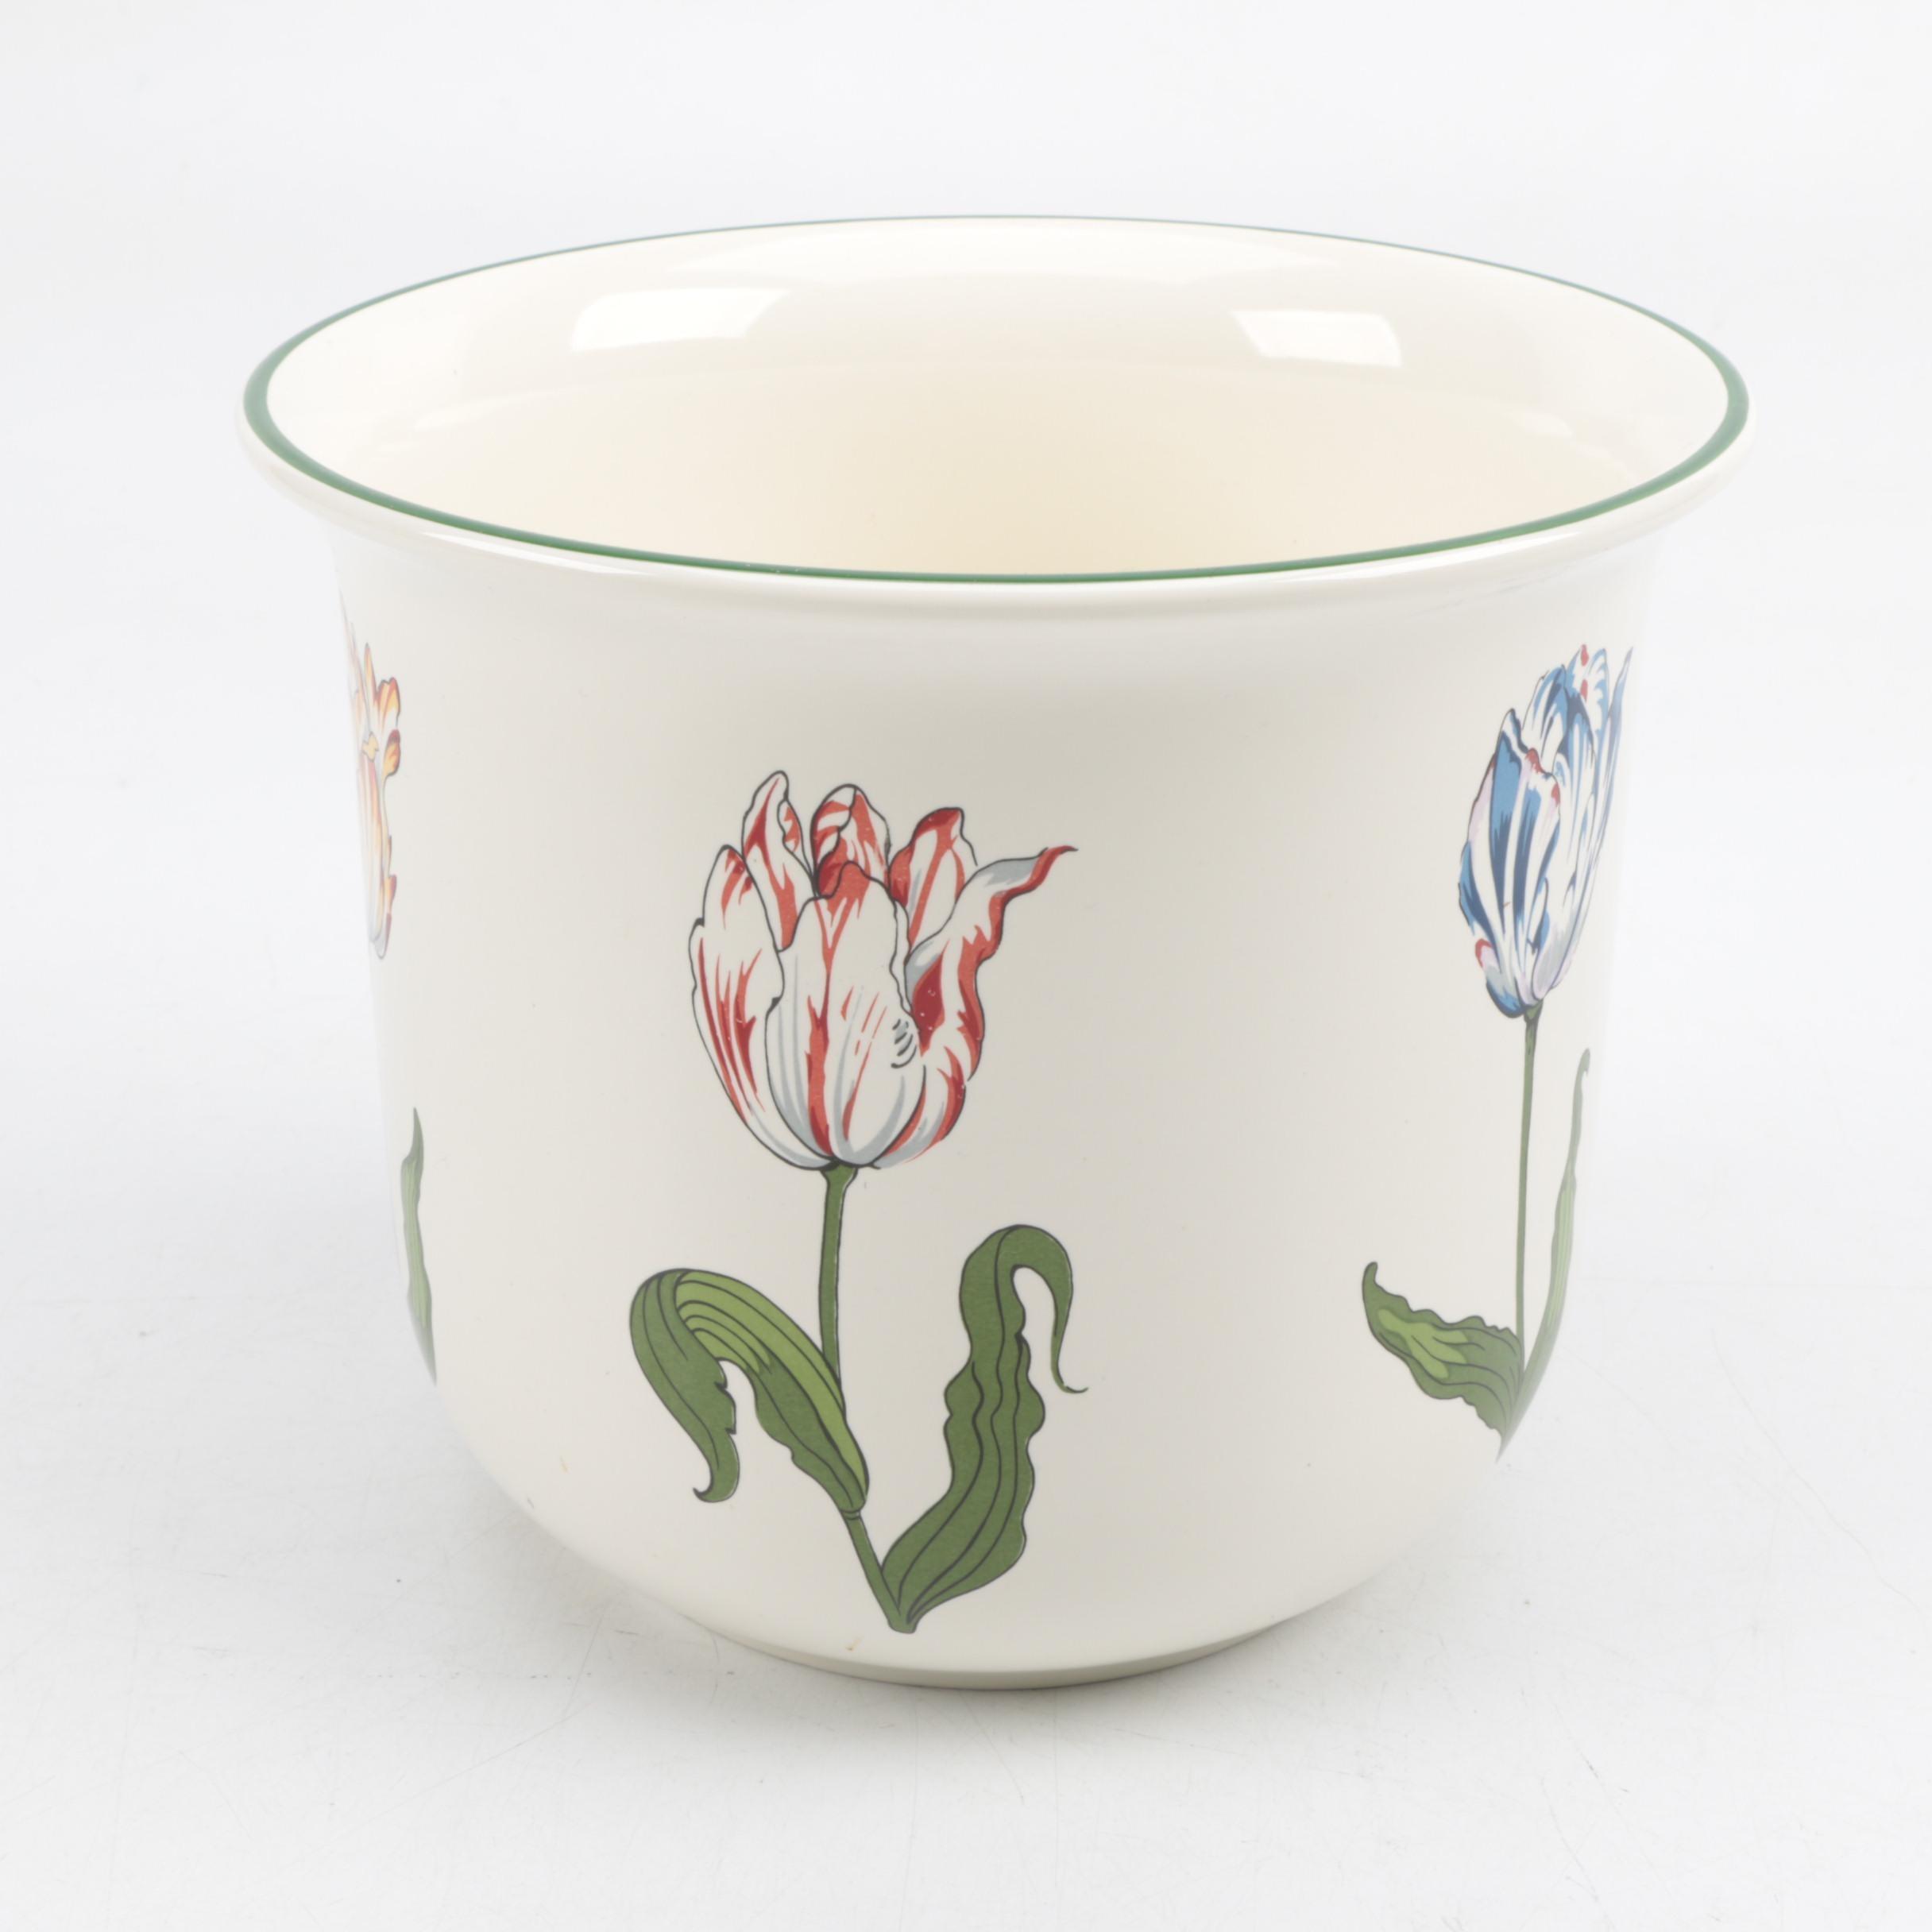 Tiffany & Co. Ceramic Planter